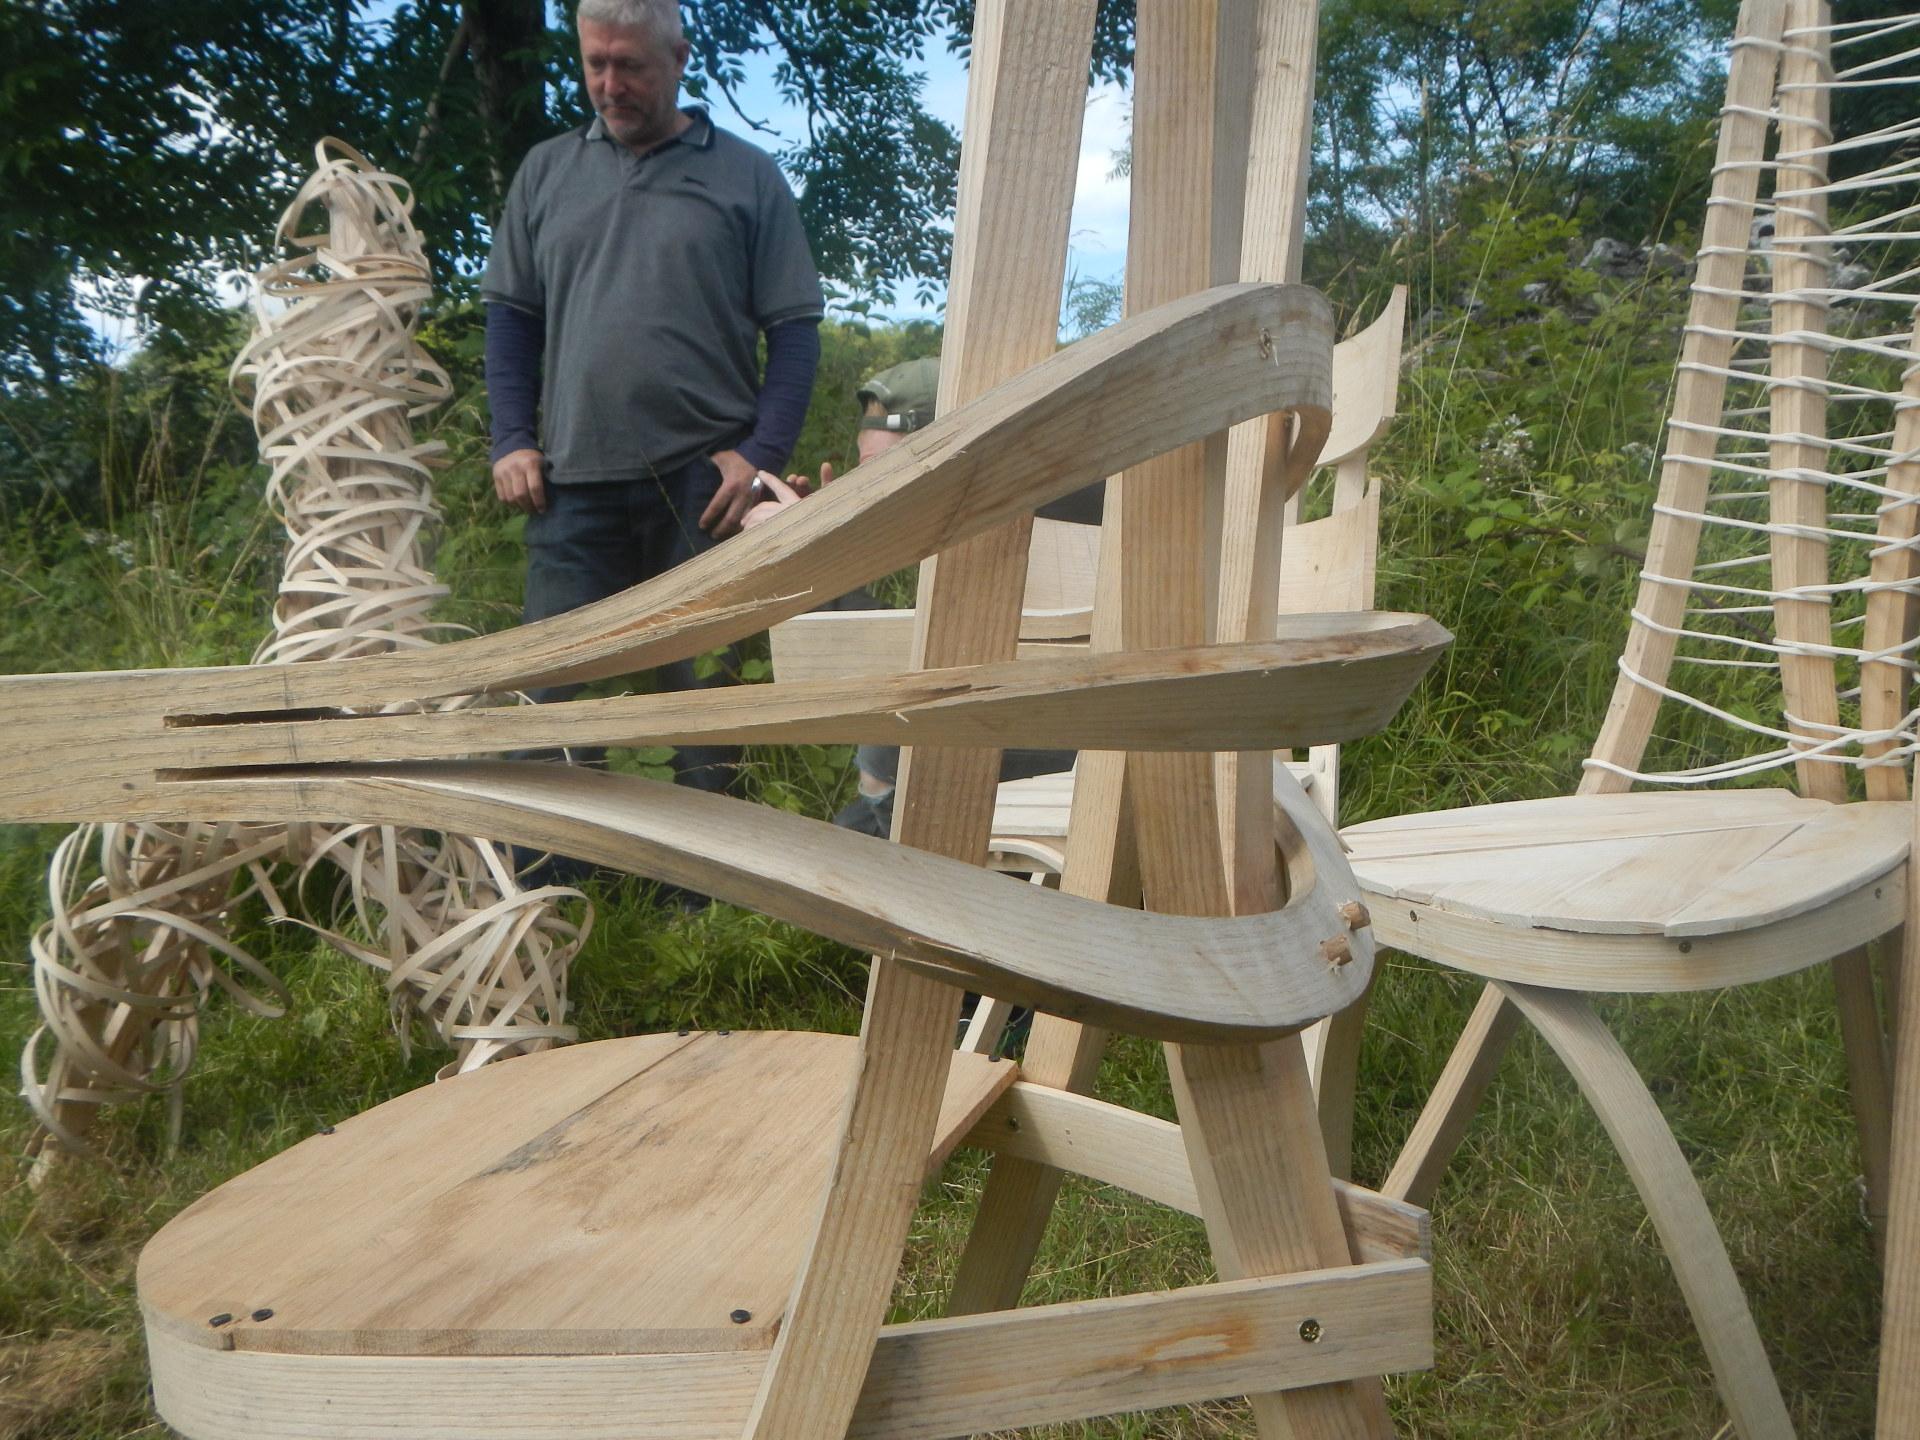 chair, steambent, ash, Cumbrian, woodwork